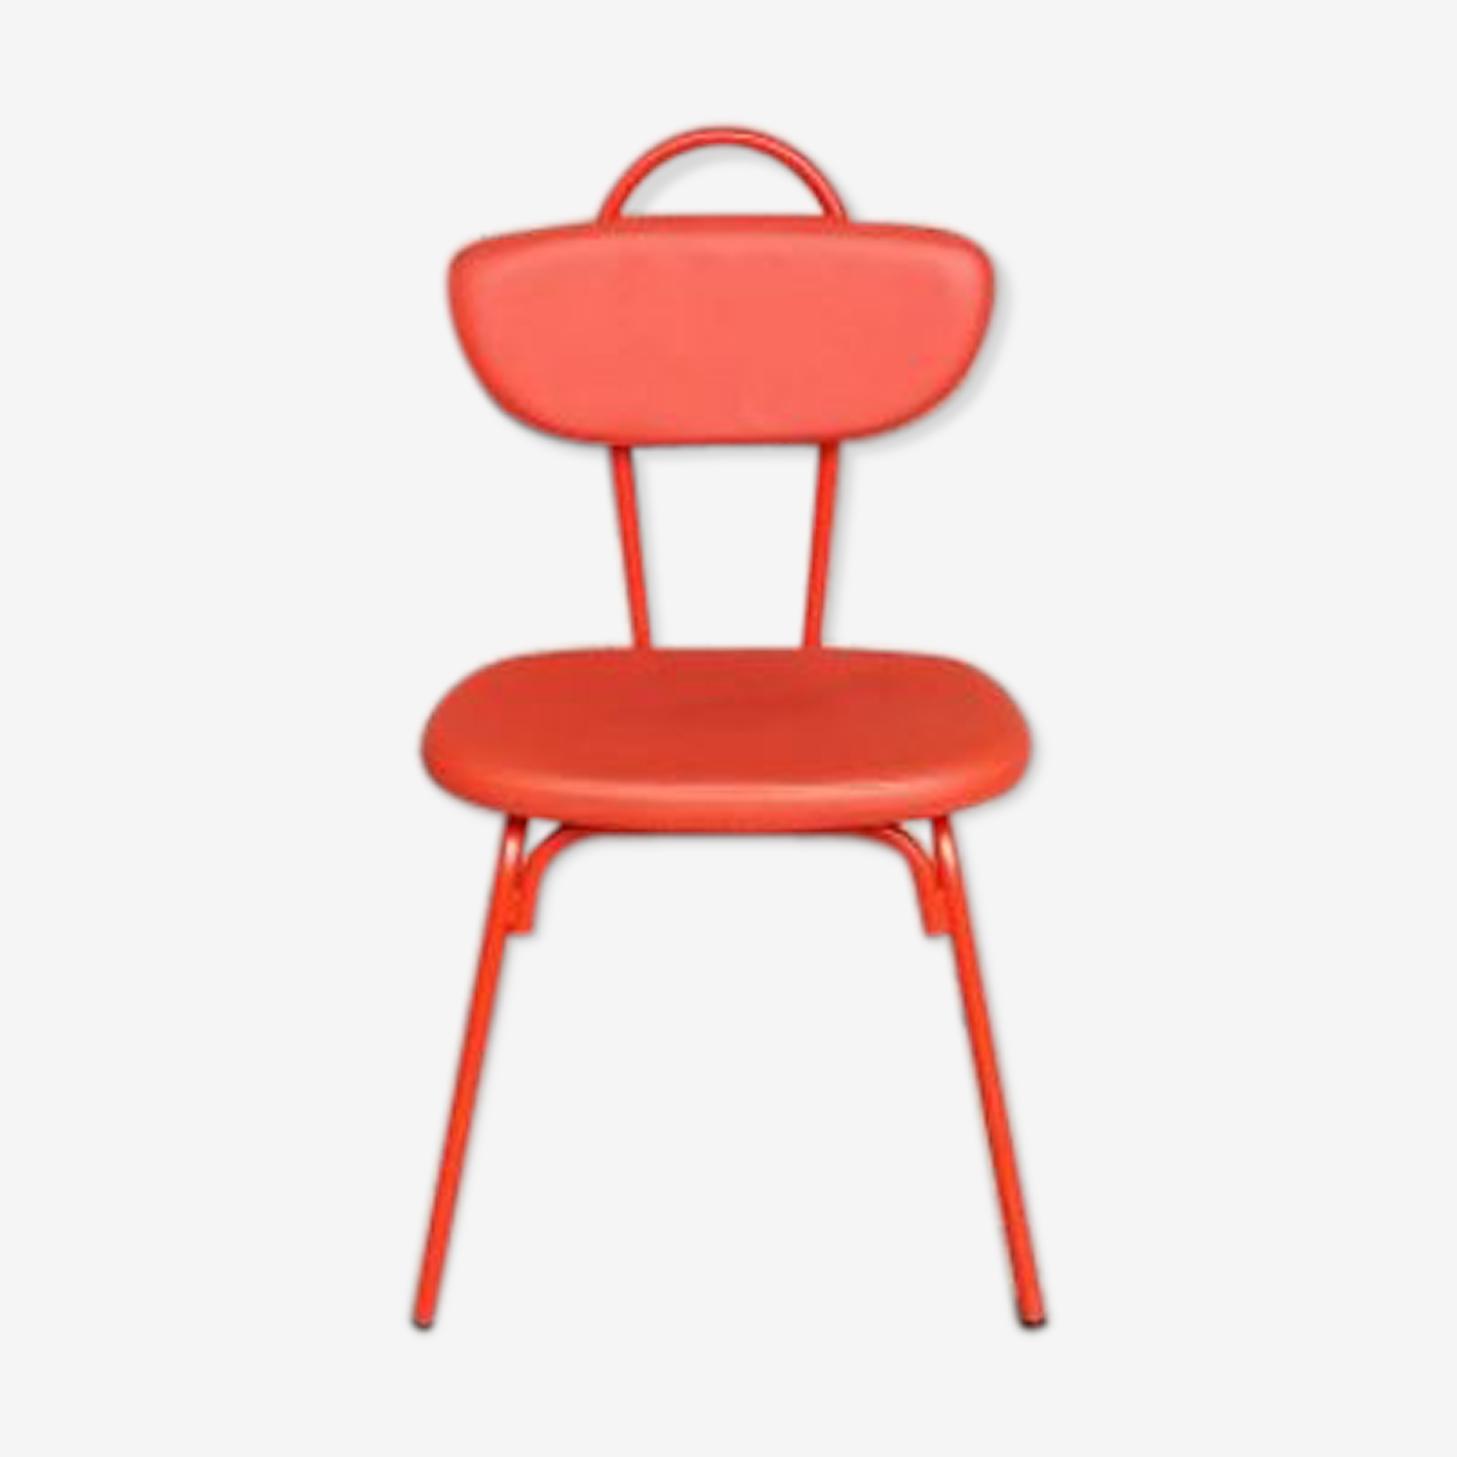 Chaises rouge orange